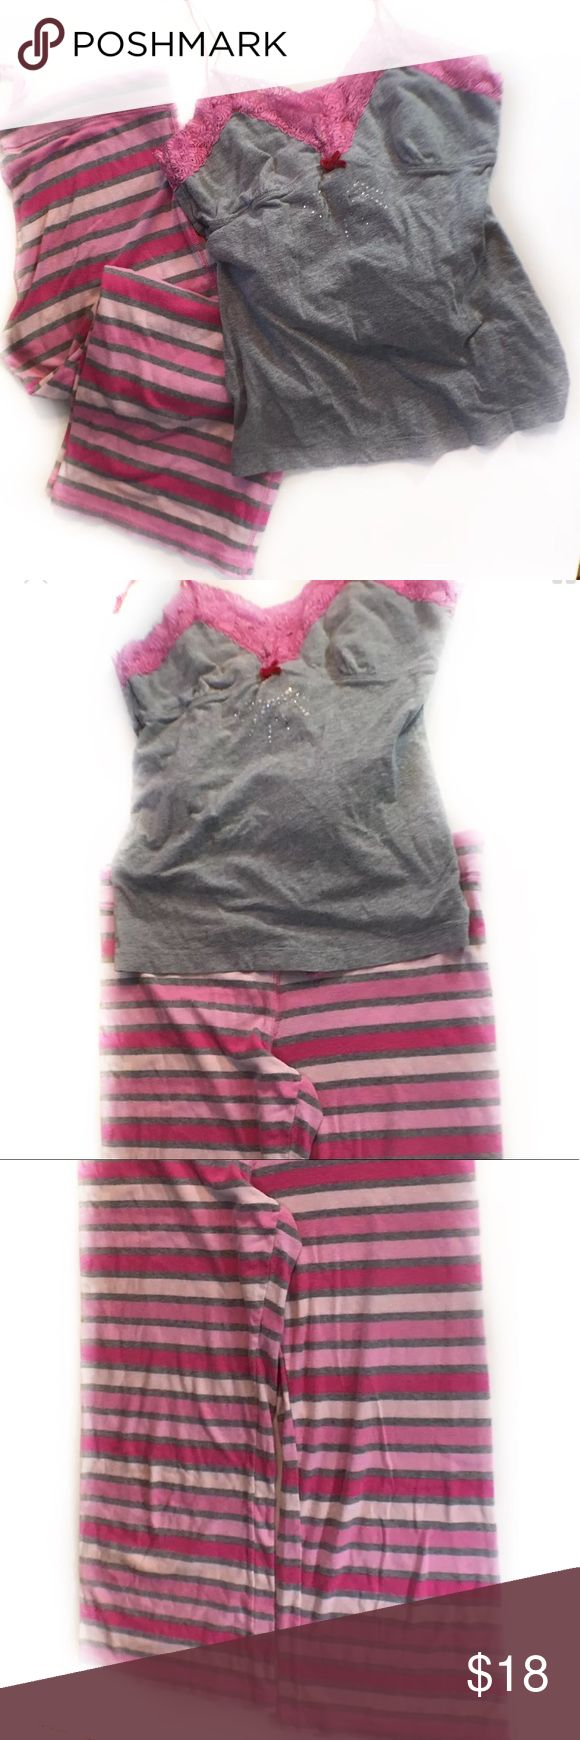 "Victoria Secret Love Pink PJ Pajama Bottom Medium Victoria Secret Love Pink PJ Pajama Bottom Striped Sleep Pants W/LP Shirt Medium  18"" waist 30"" length   17"" arm pit to arm pit 24"" length PINK Victoria's Secret Intimates & Sleepwear Pajamas"